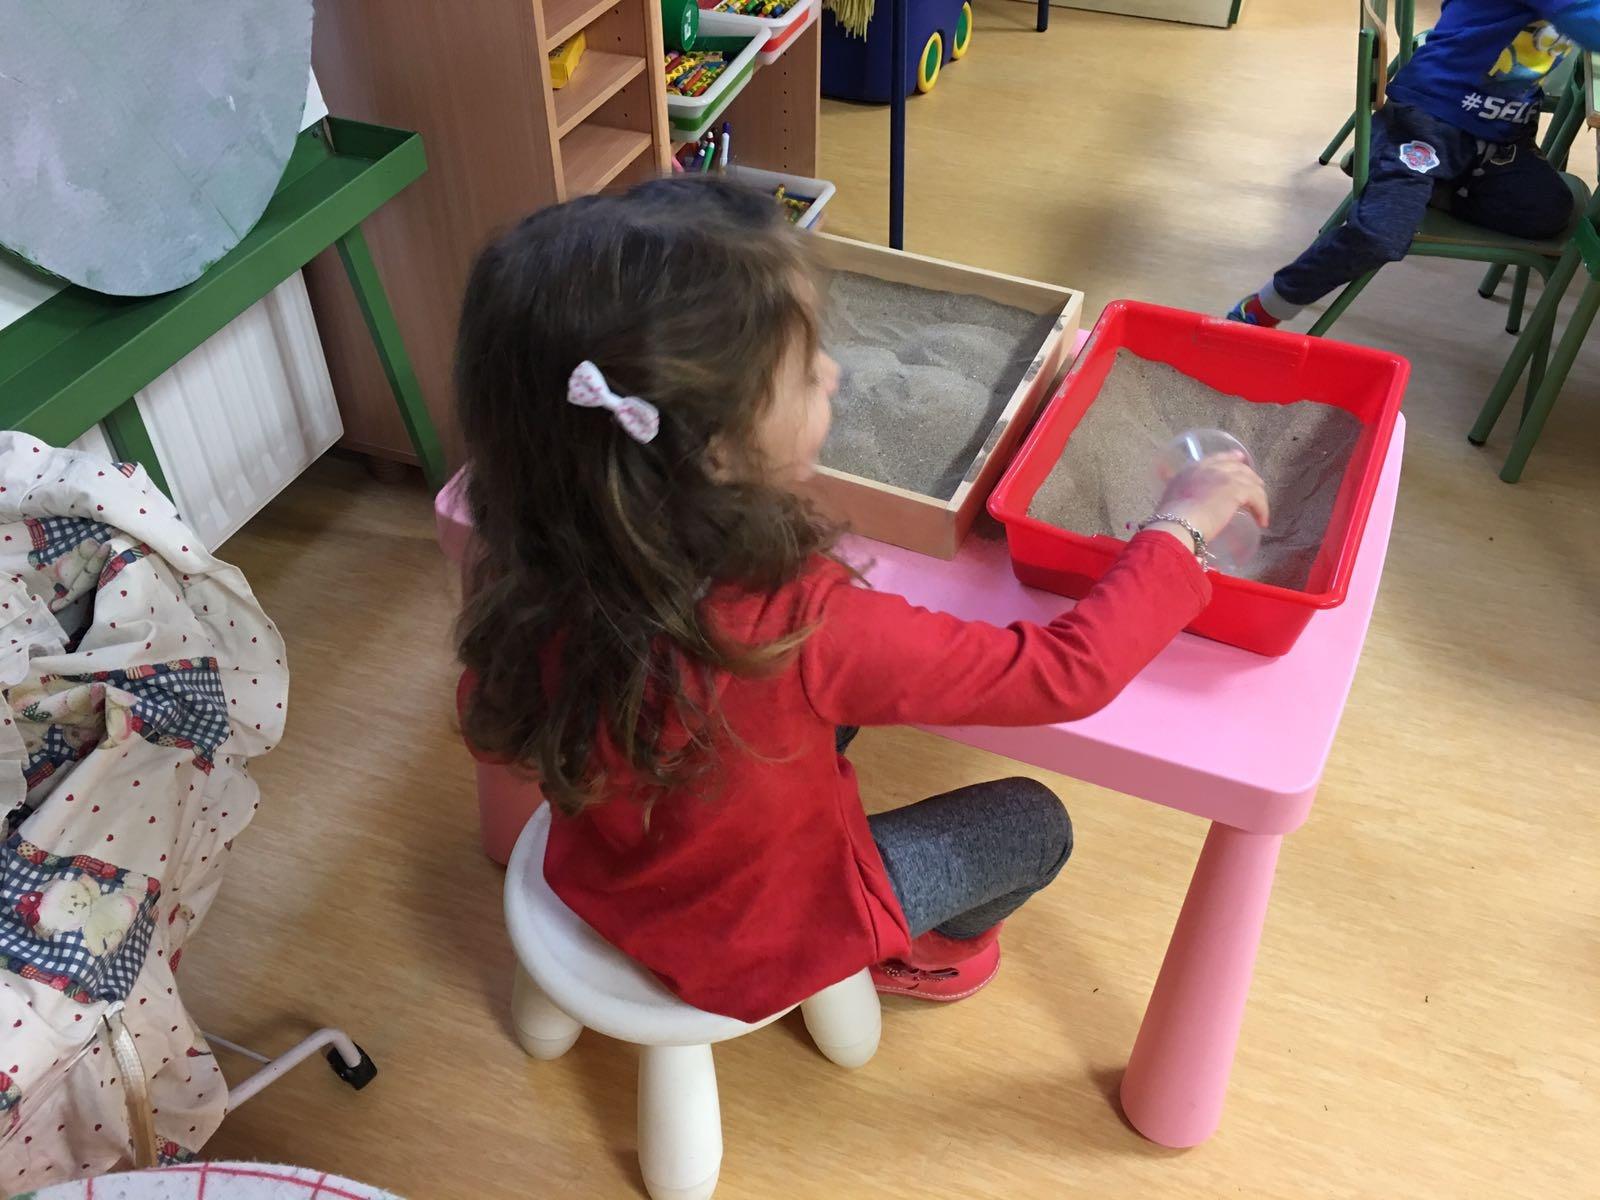 E. Infantil y sus proyectos 1